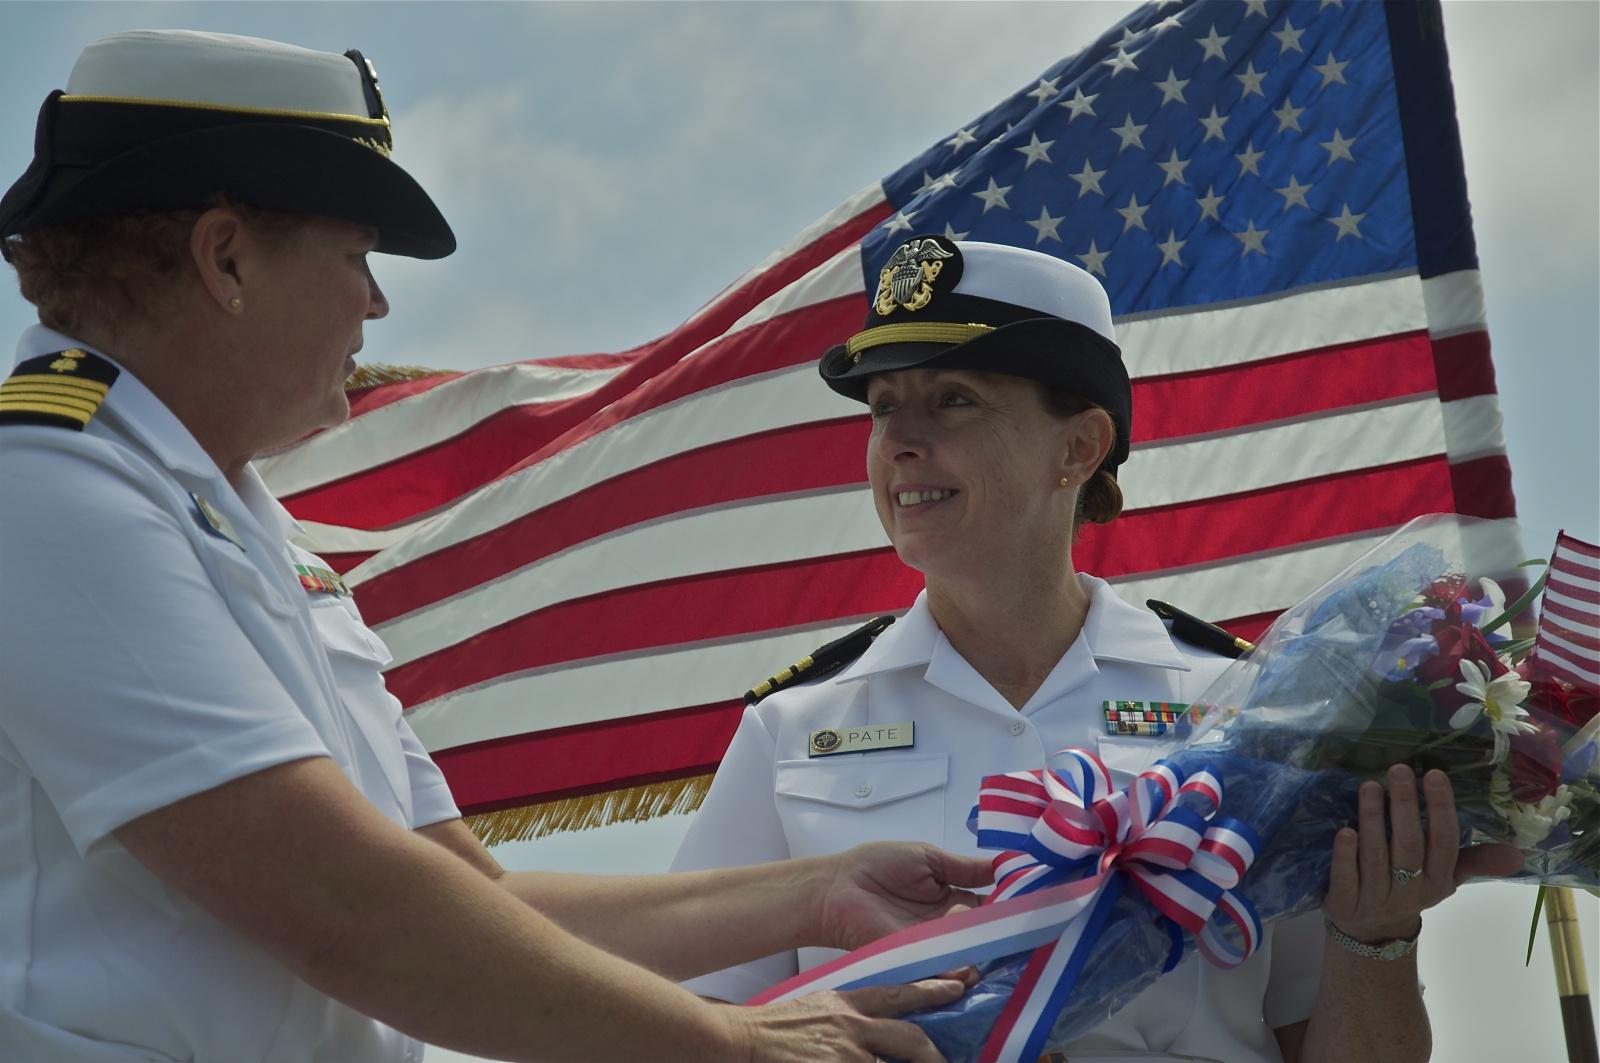 U.S.A. - agosto 2011